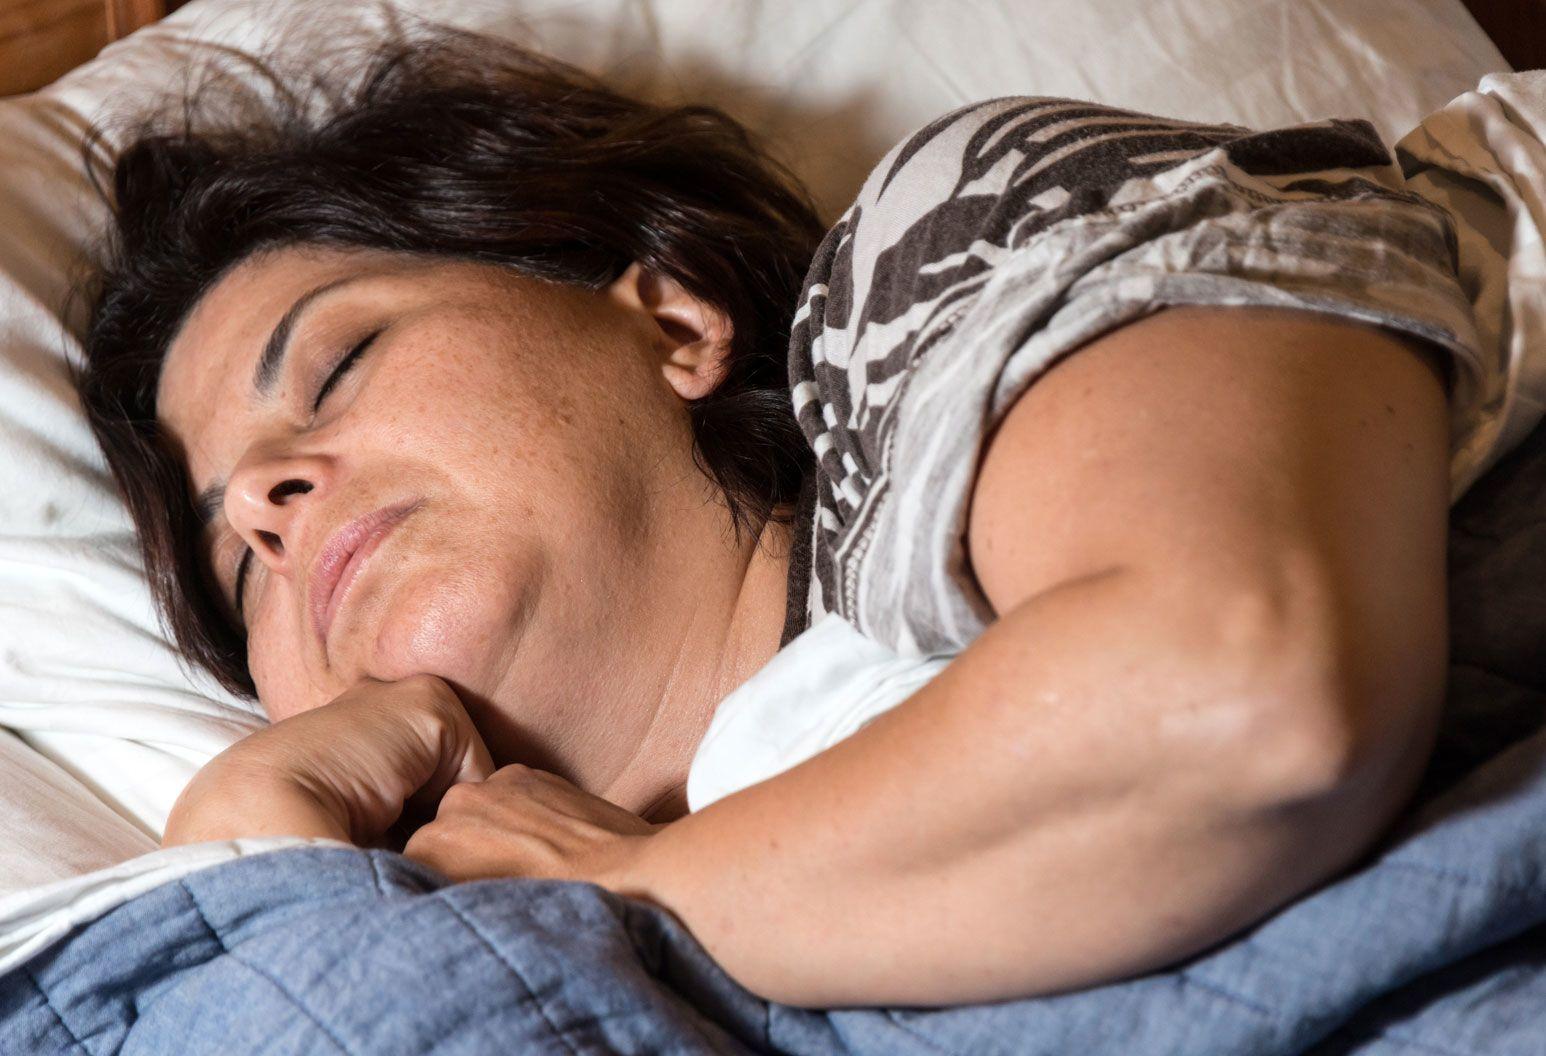 Woman with brown hair sleeping